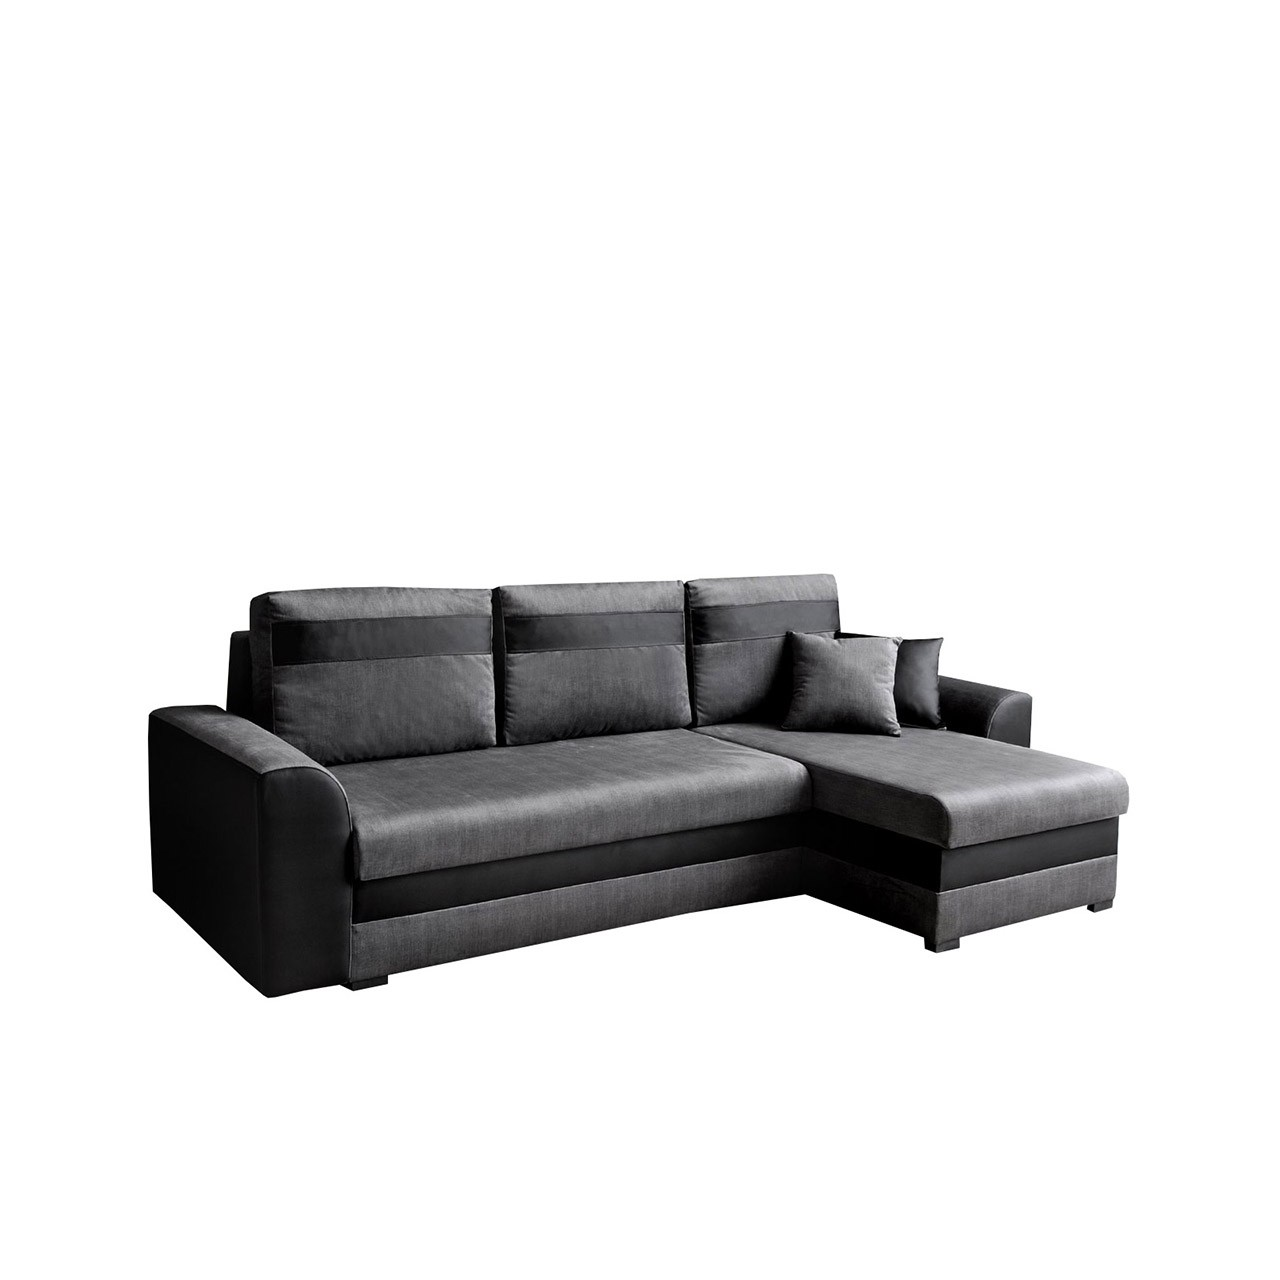 Ikea Ecksofa Mit Schlaffunktion Ikea Sessel Schlaffunktion Carprola For Stilvolle Ikea Ecksofa